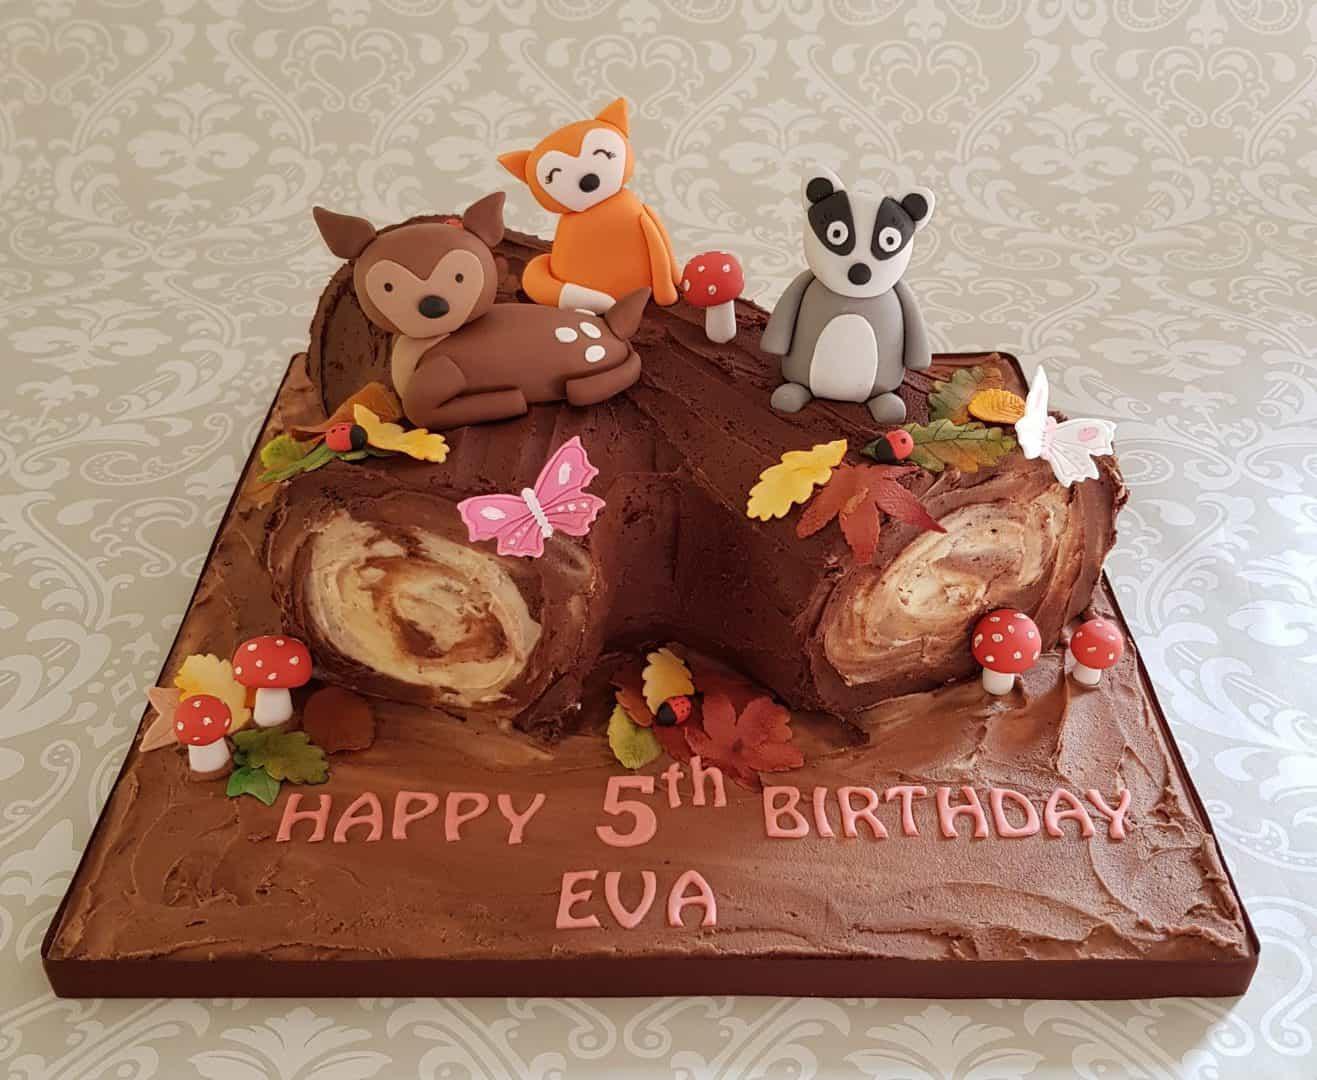 Football supporter cake